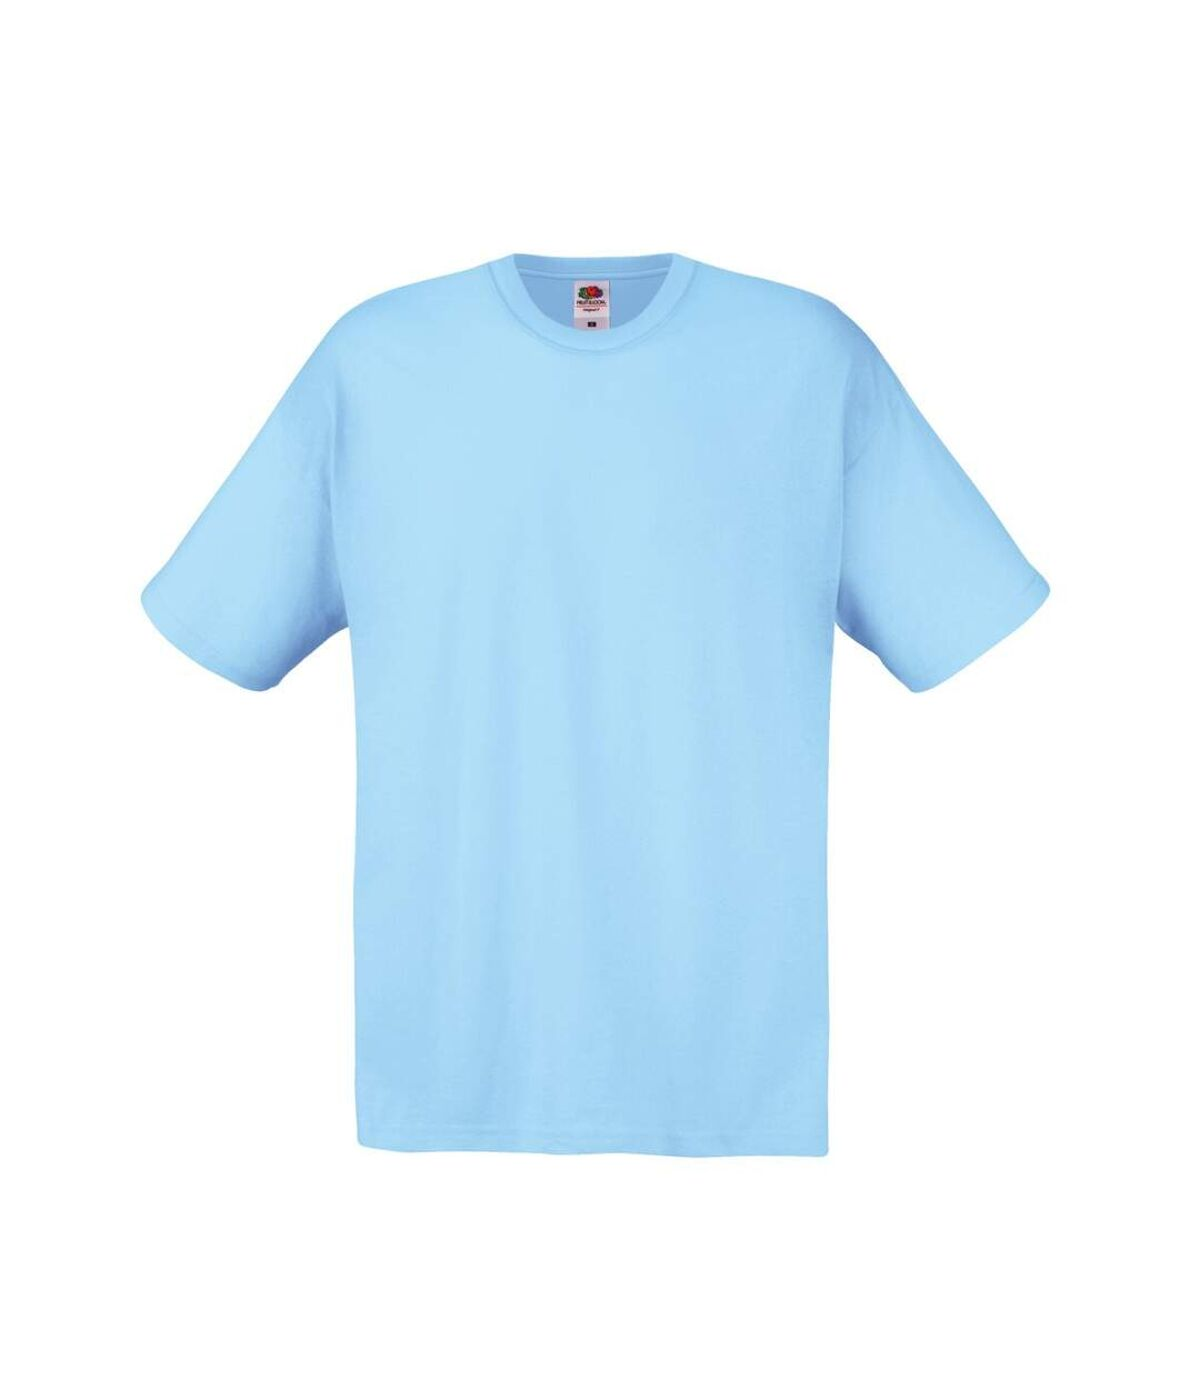 Fruit Of The Loom - T-shirt ORIGINAL - Homme (Violet) - UTBC340